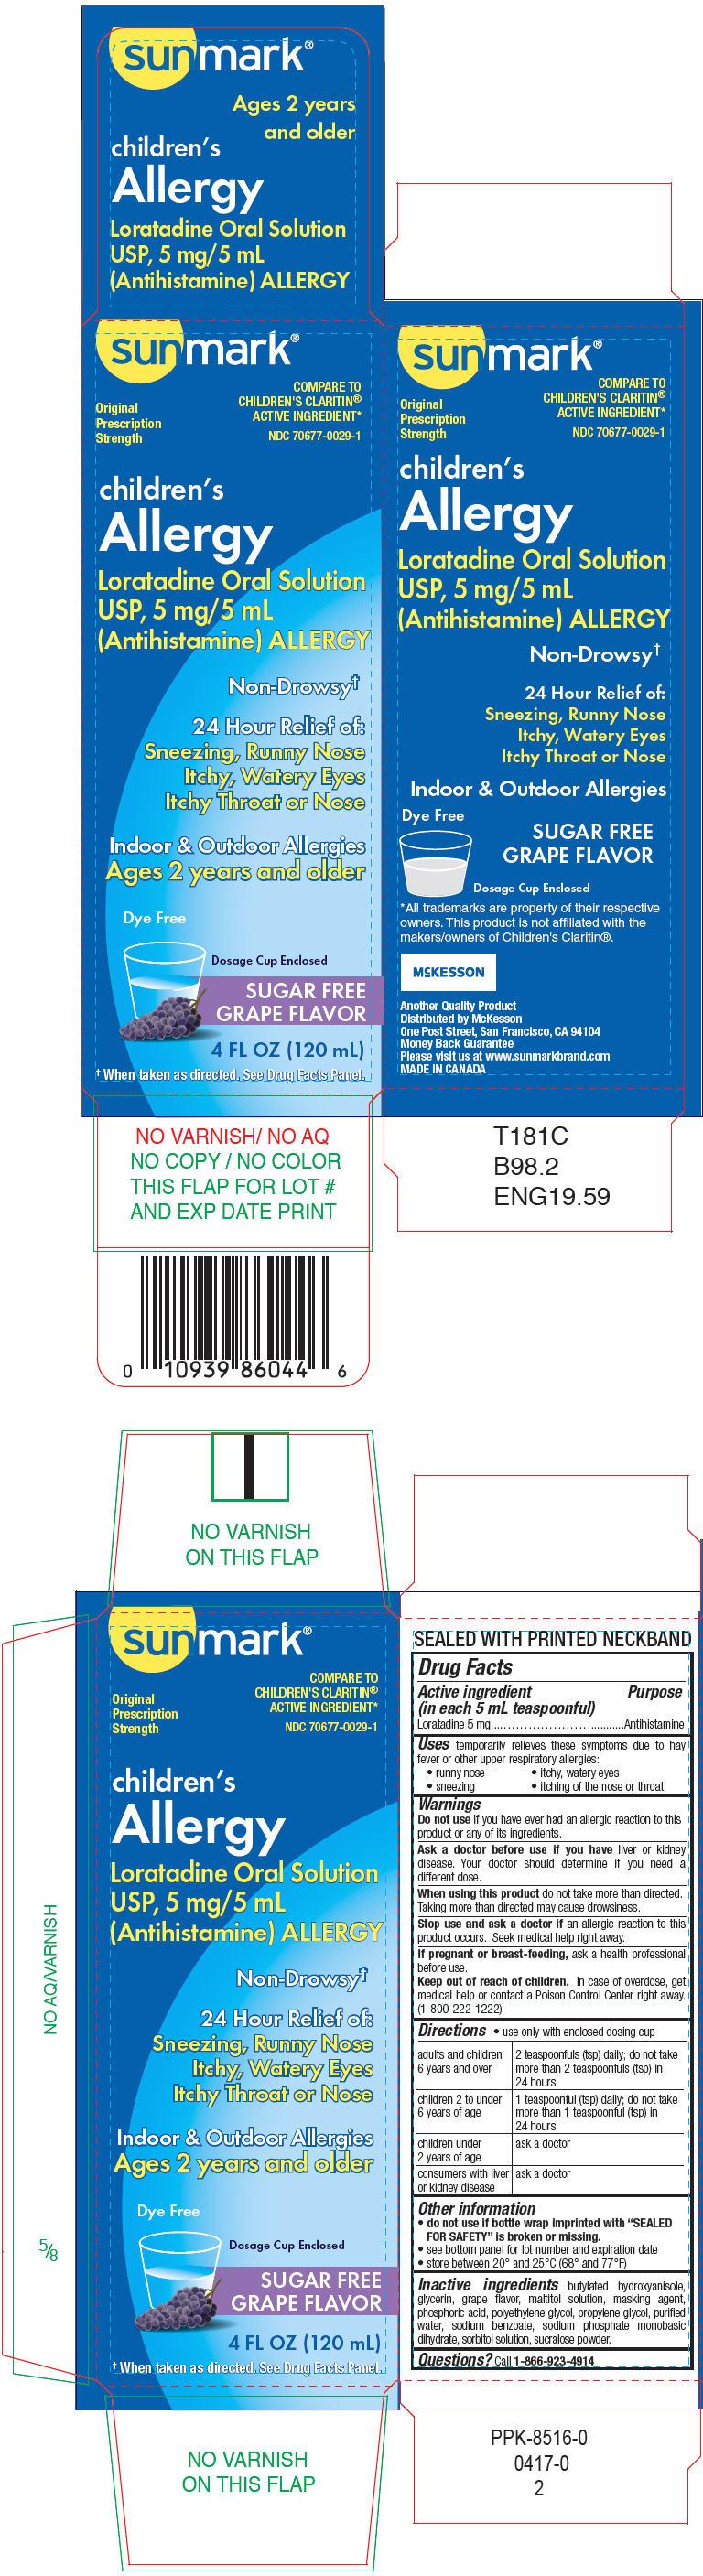 PRINCIPAL DISPLAY PANEL - 120 mL Bottle Carton